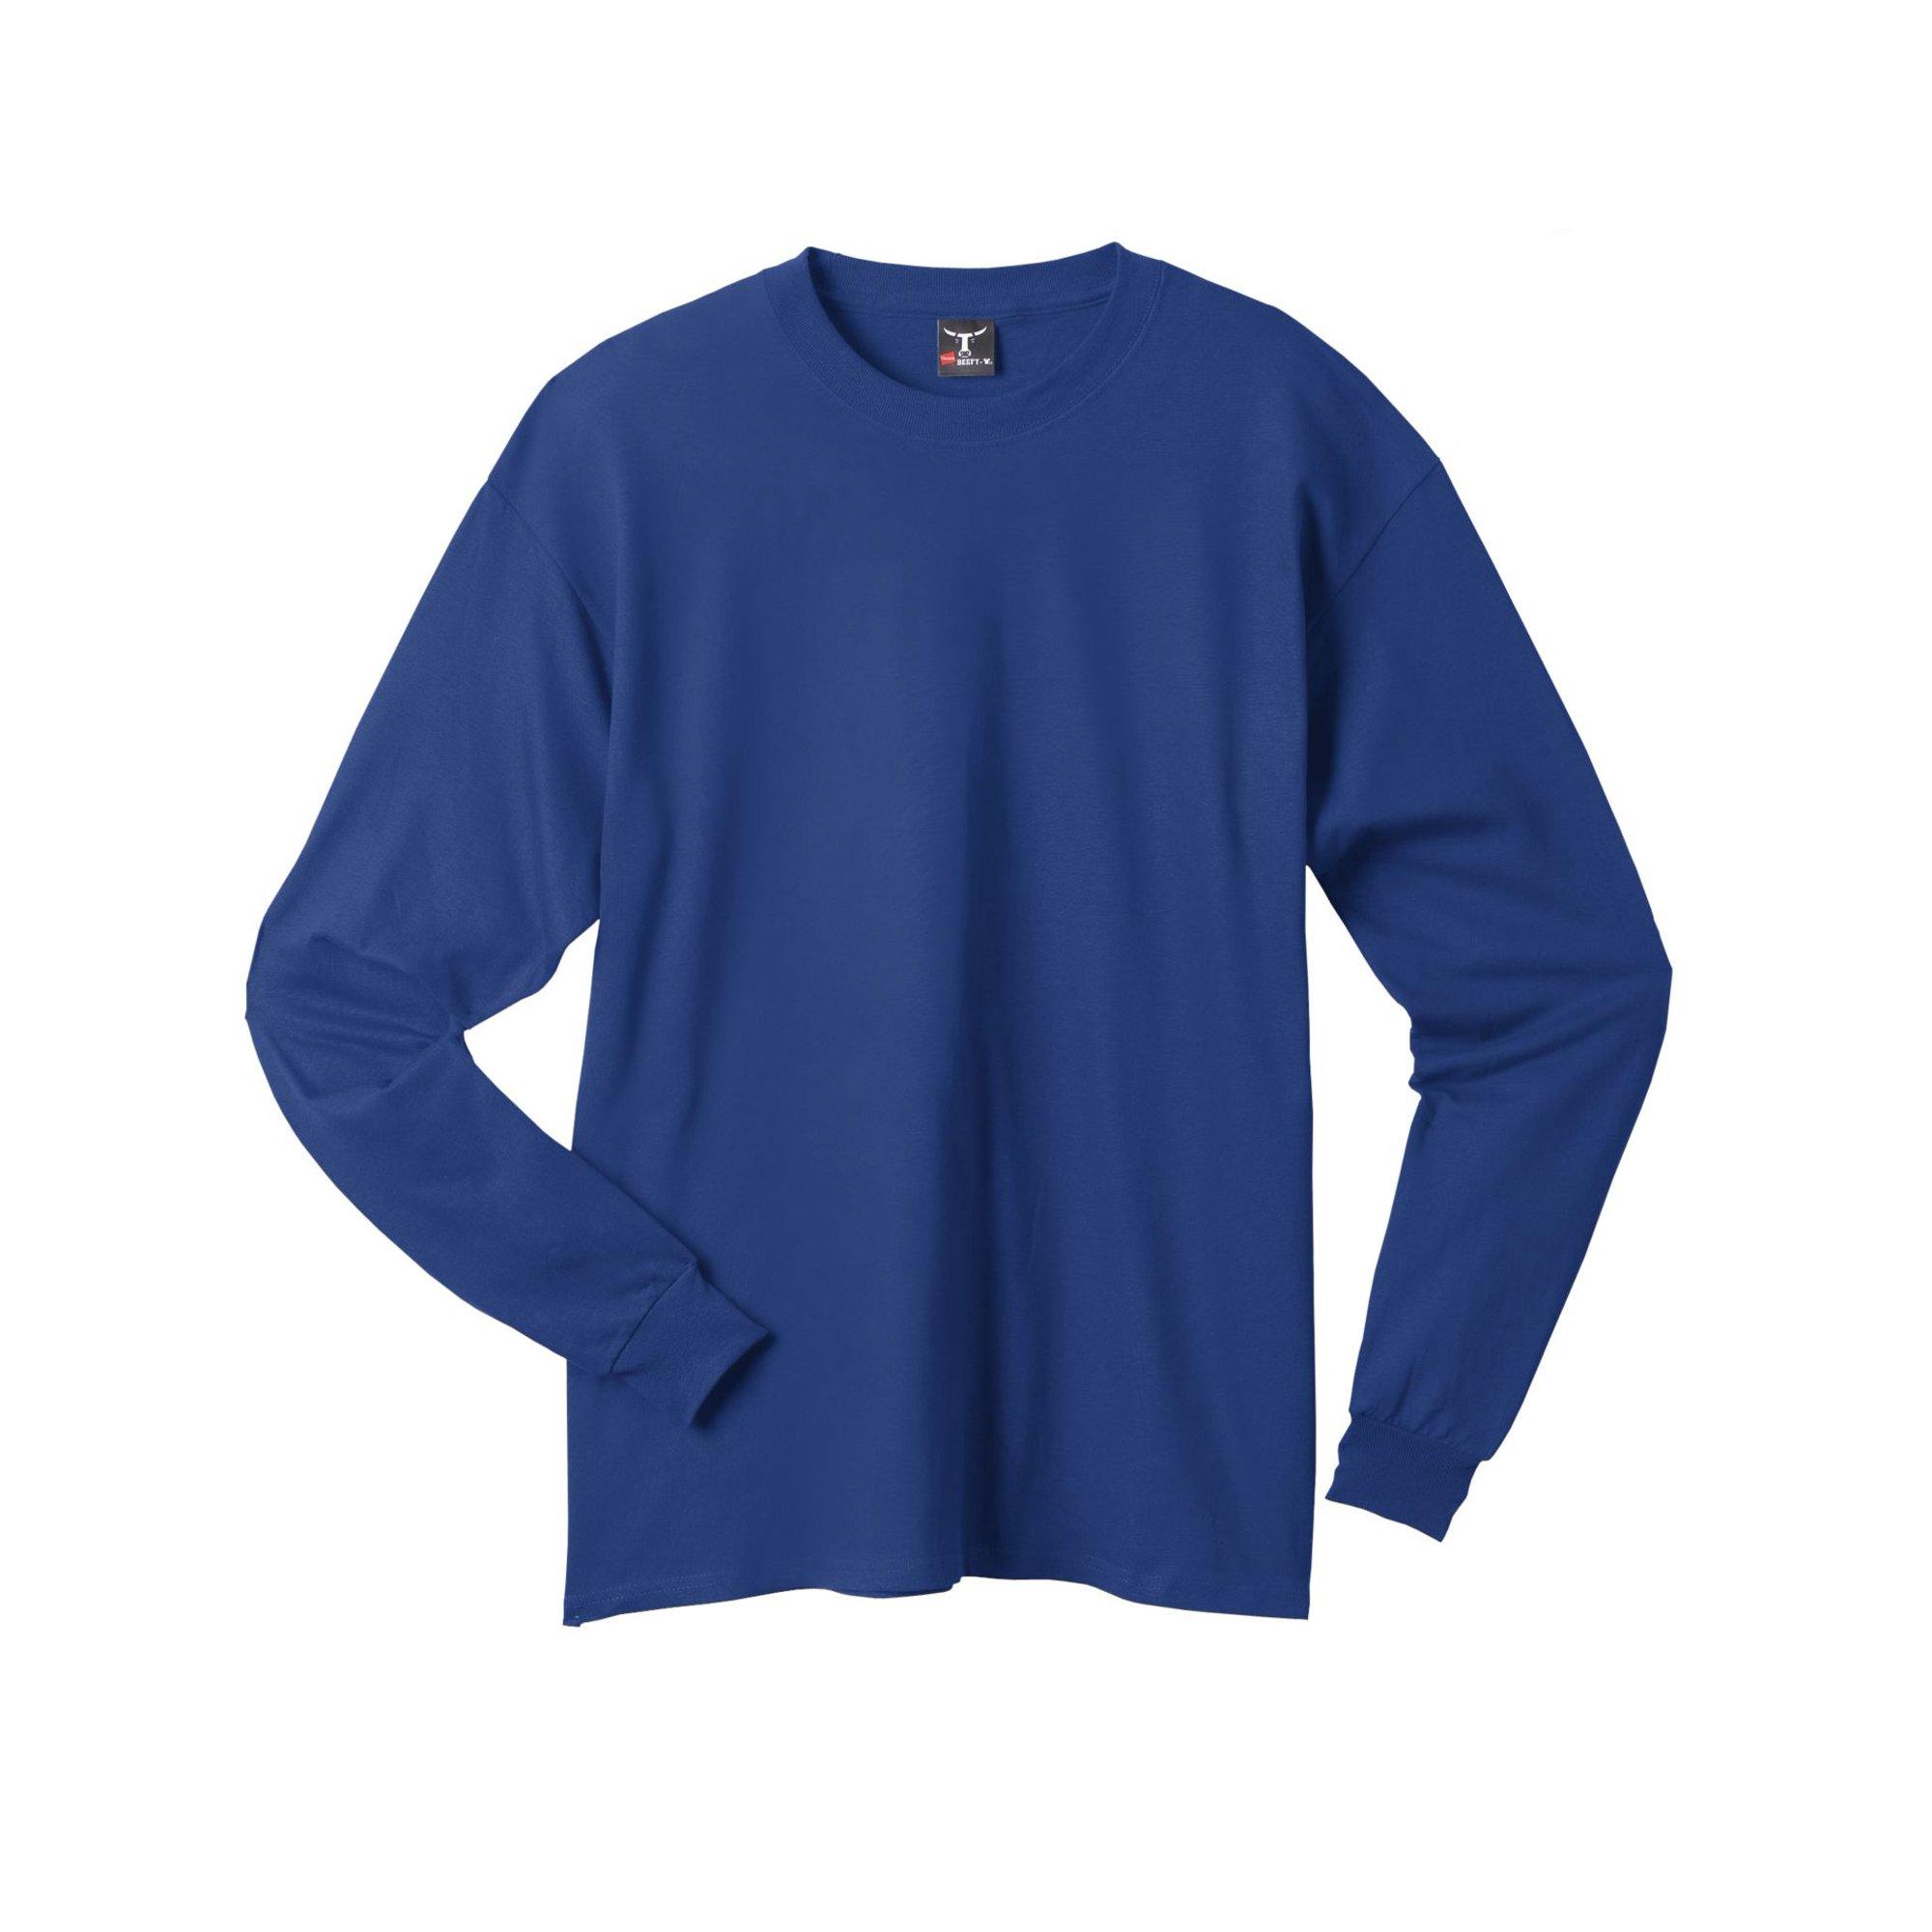 26bbb976389178 Hanes Beefy T Shirts Long Sleeve - DREAMWORKS